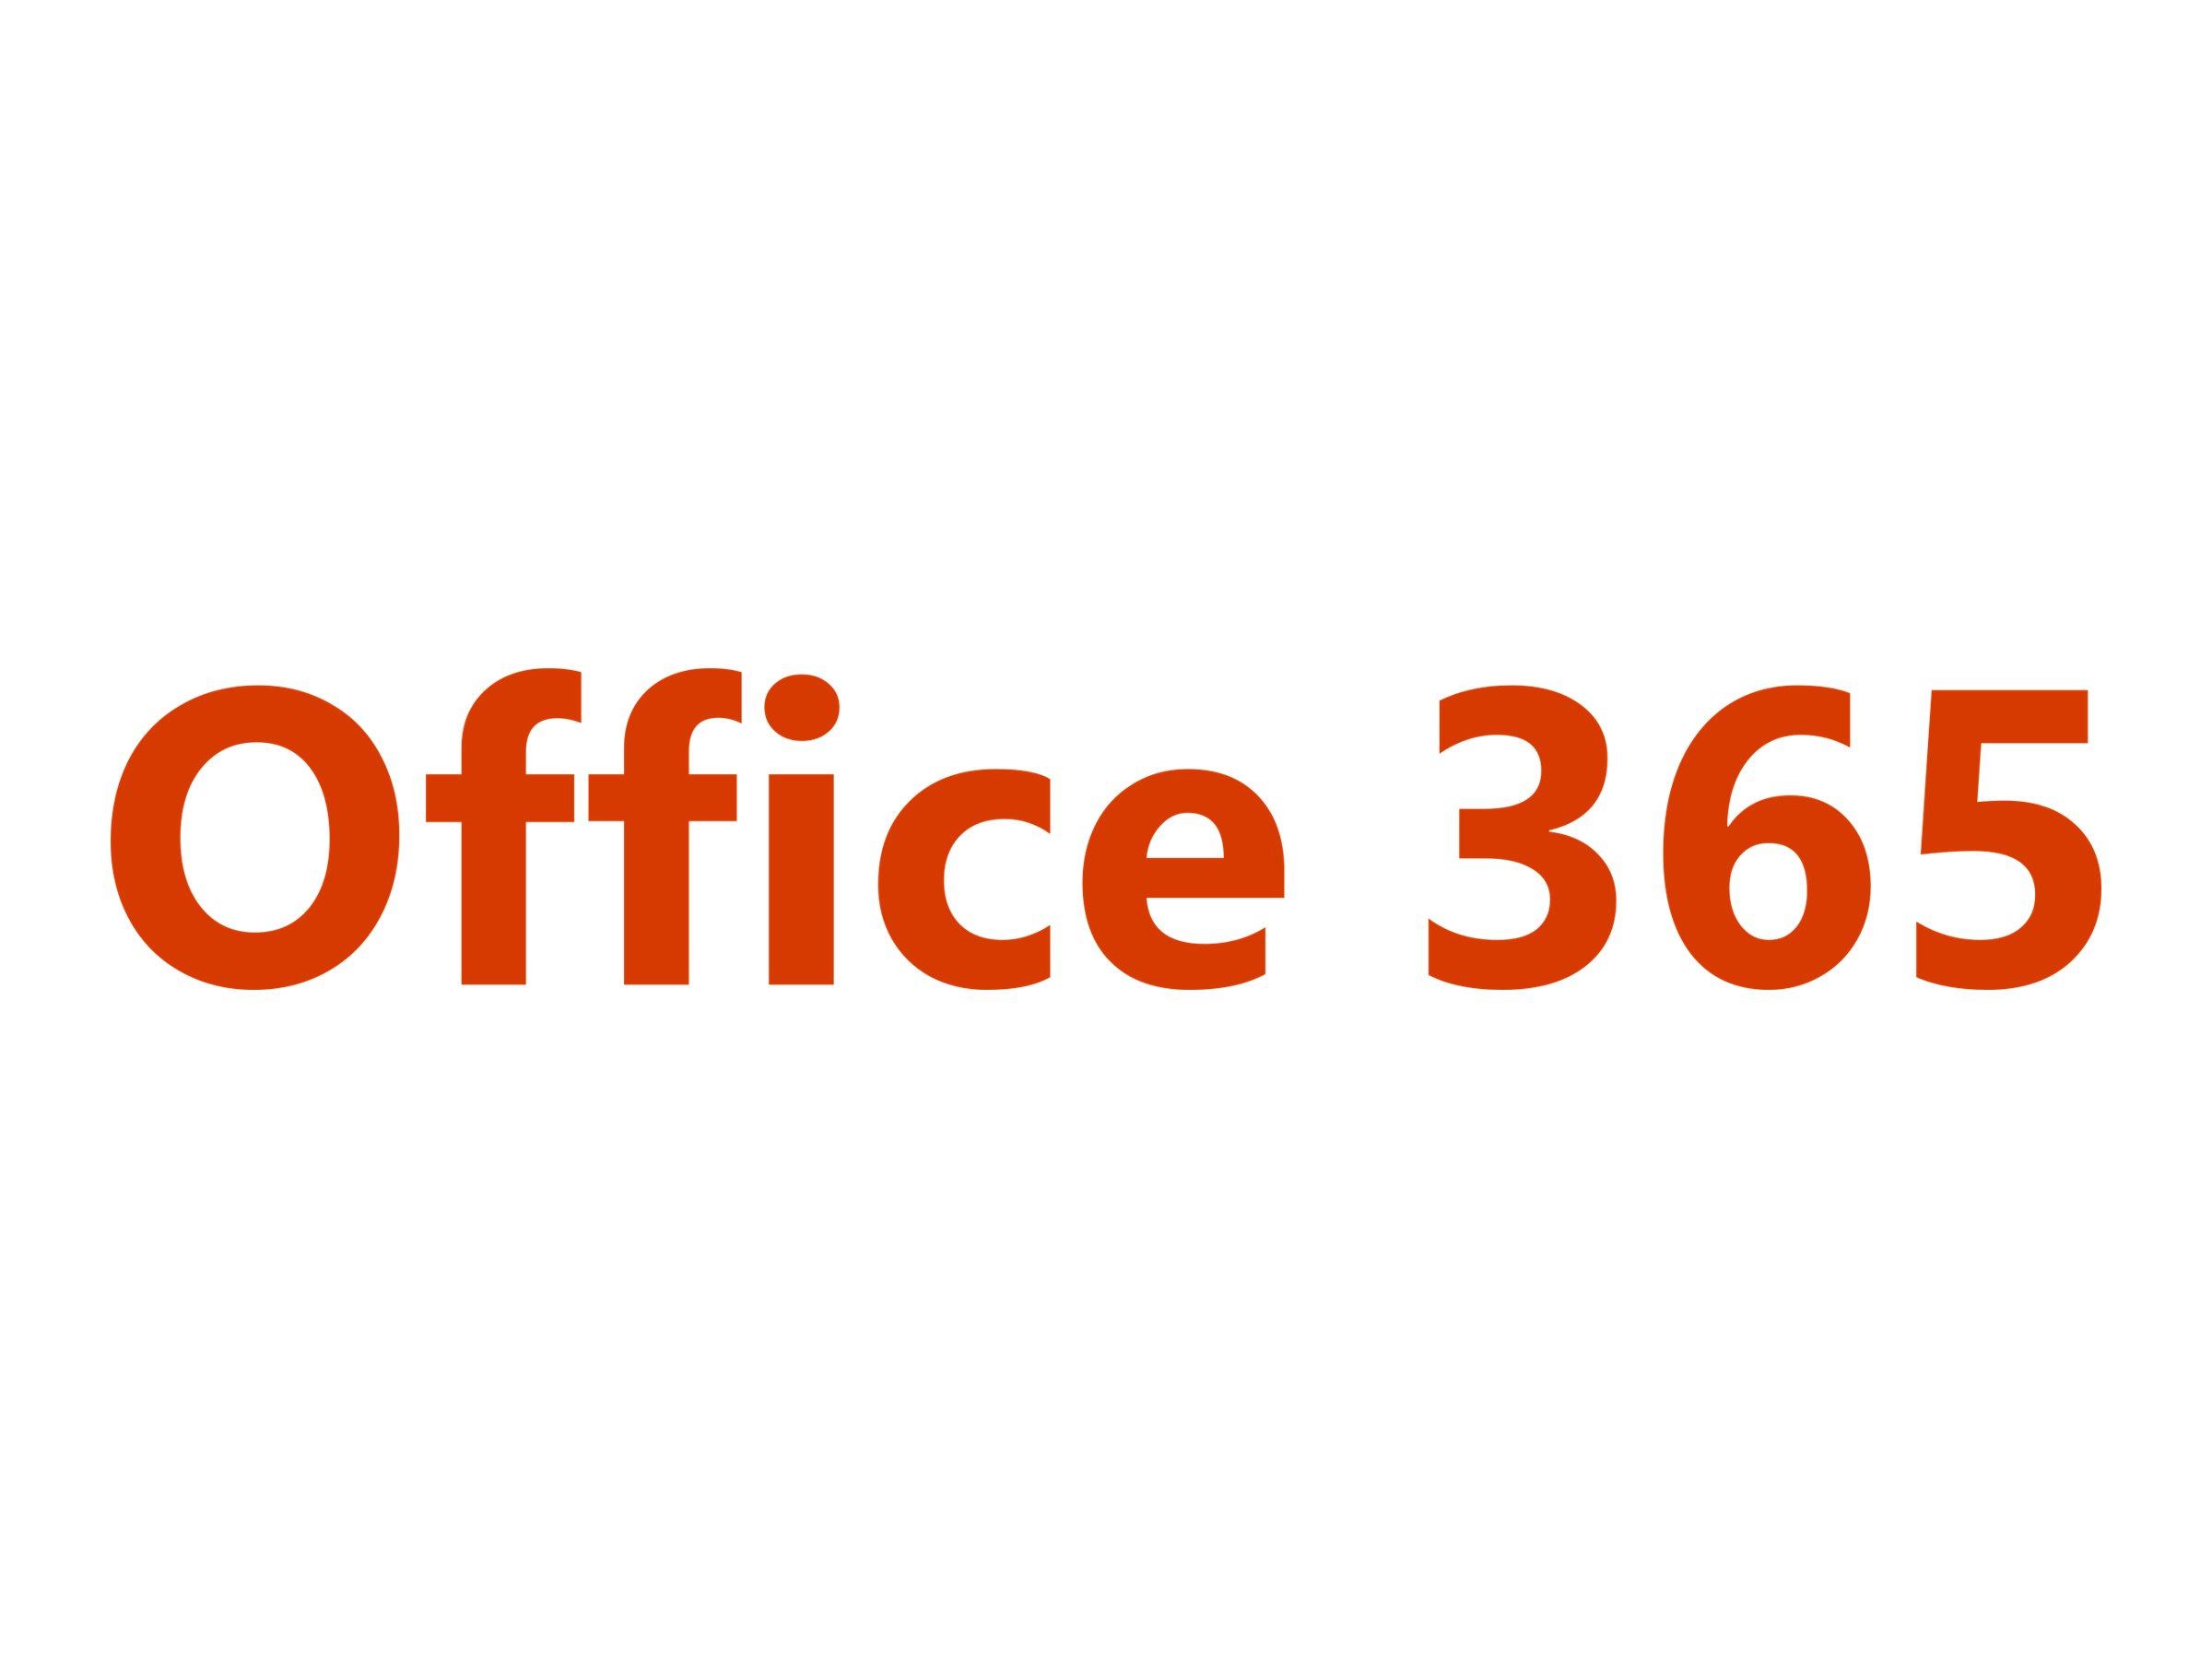 Microsoft Office 365 Extra File Storage Add-on - Abonnement-Lizenz (1 Monat)